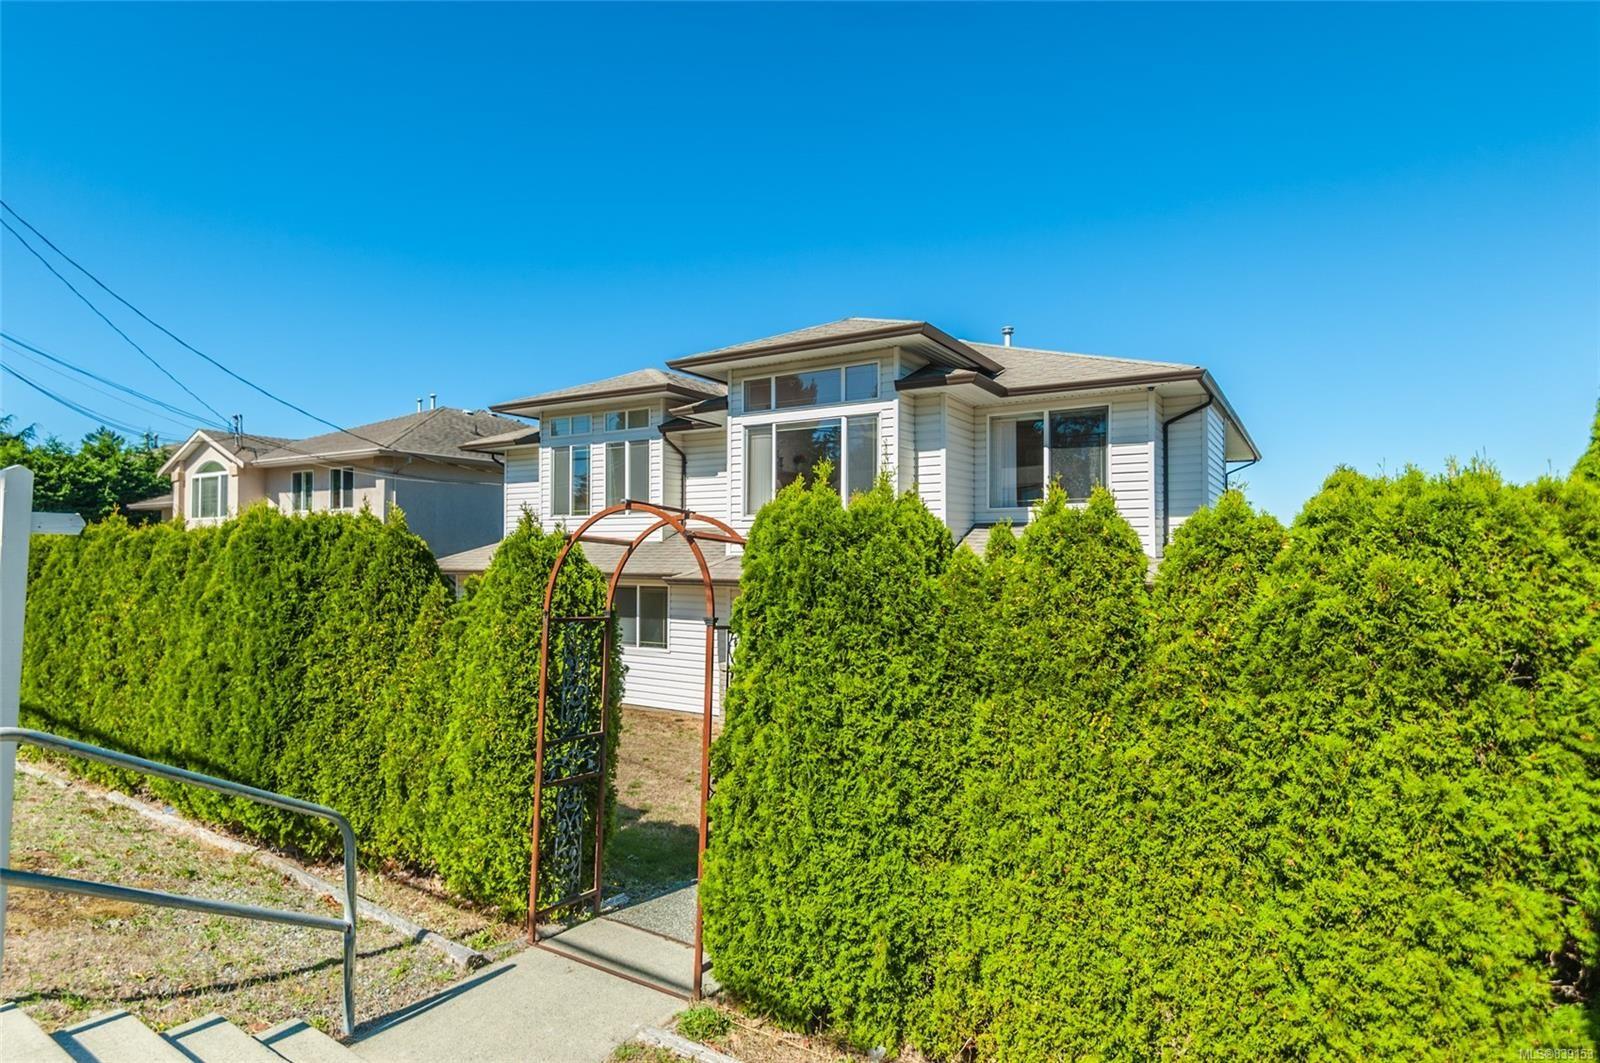 Photo 32: Photos: 6412 Dover Rd in NANAIMO: Na North Nanaimo House for sale (Nanaimo)  : MLS®# 839153